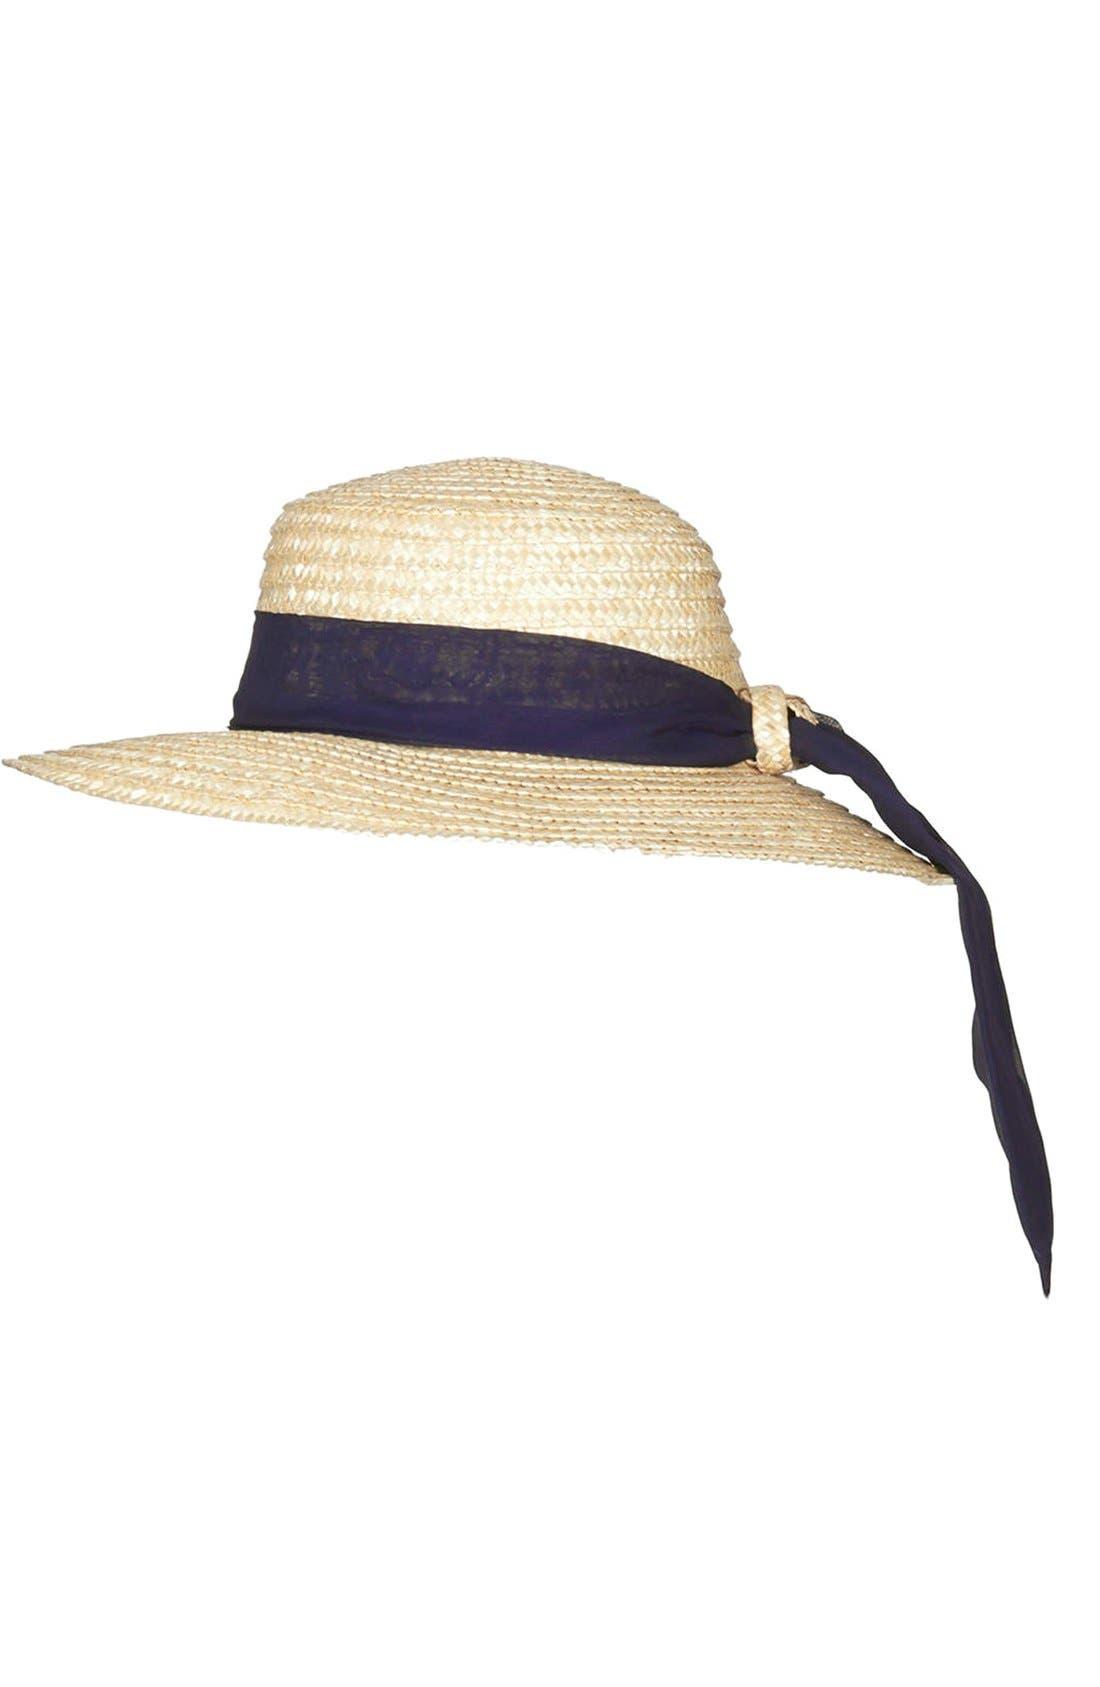 Alternate Image 1 Selected - Topshop Straw Boater Hat